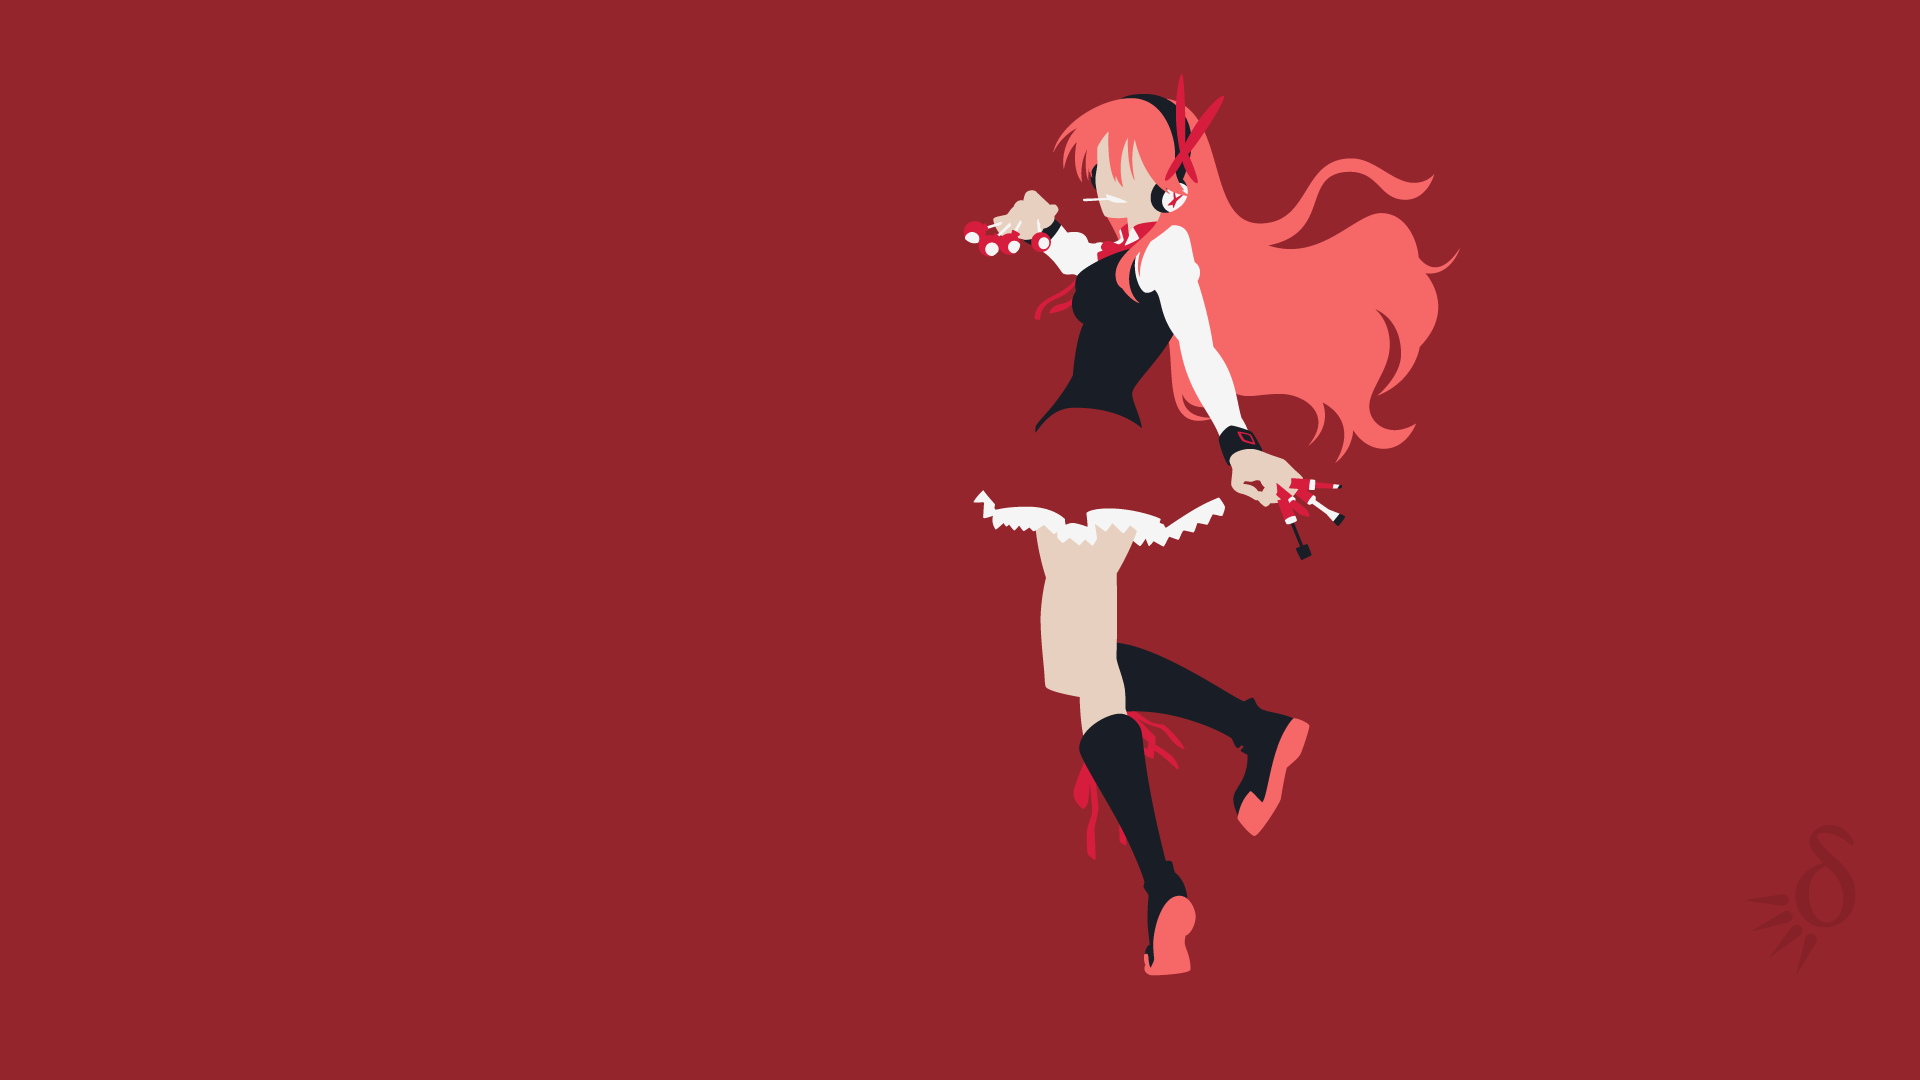 Anime Vectors Wallpapers